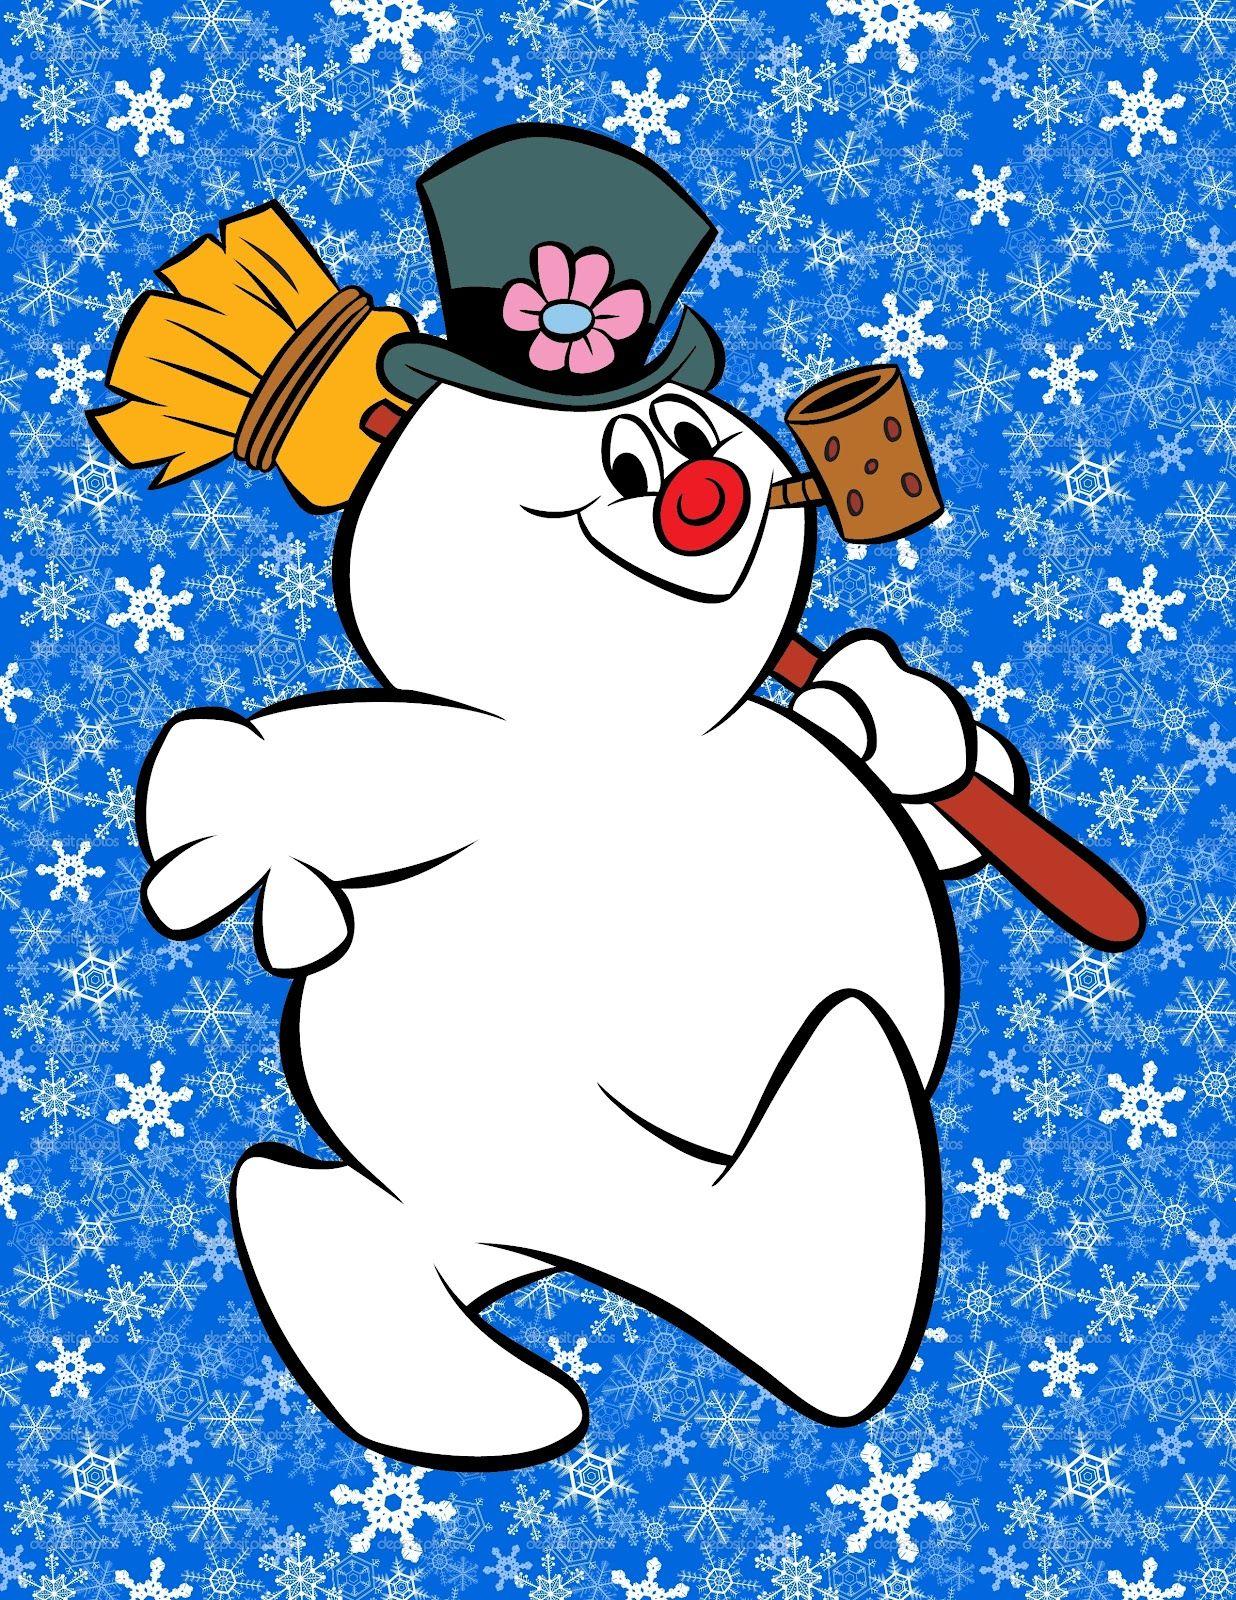 Uncategorized Frosty The Snowman Movie frosty the snowman